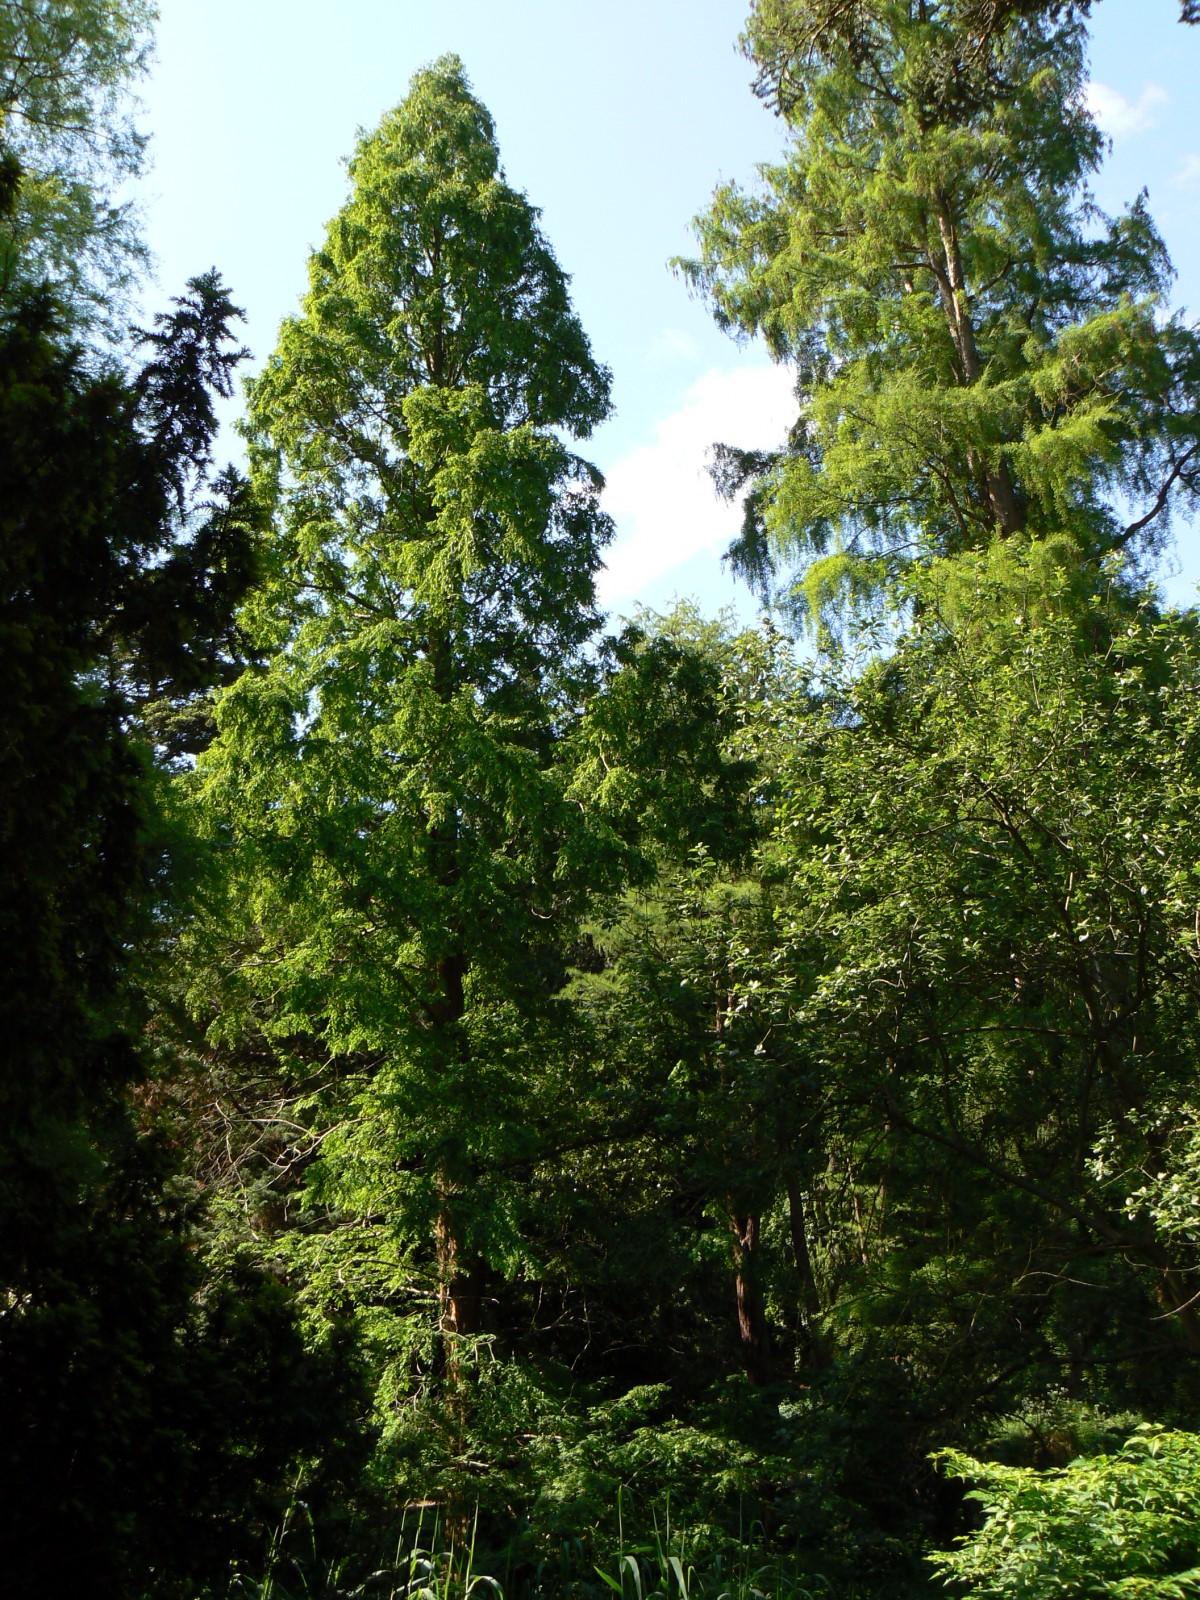 Alter Botanischer Garten (Kiel)